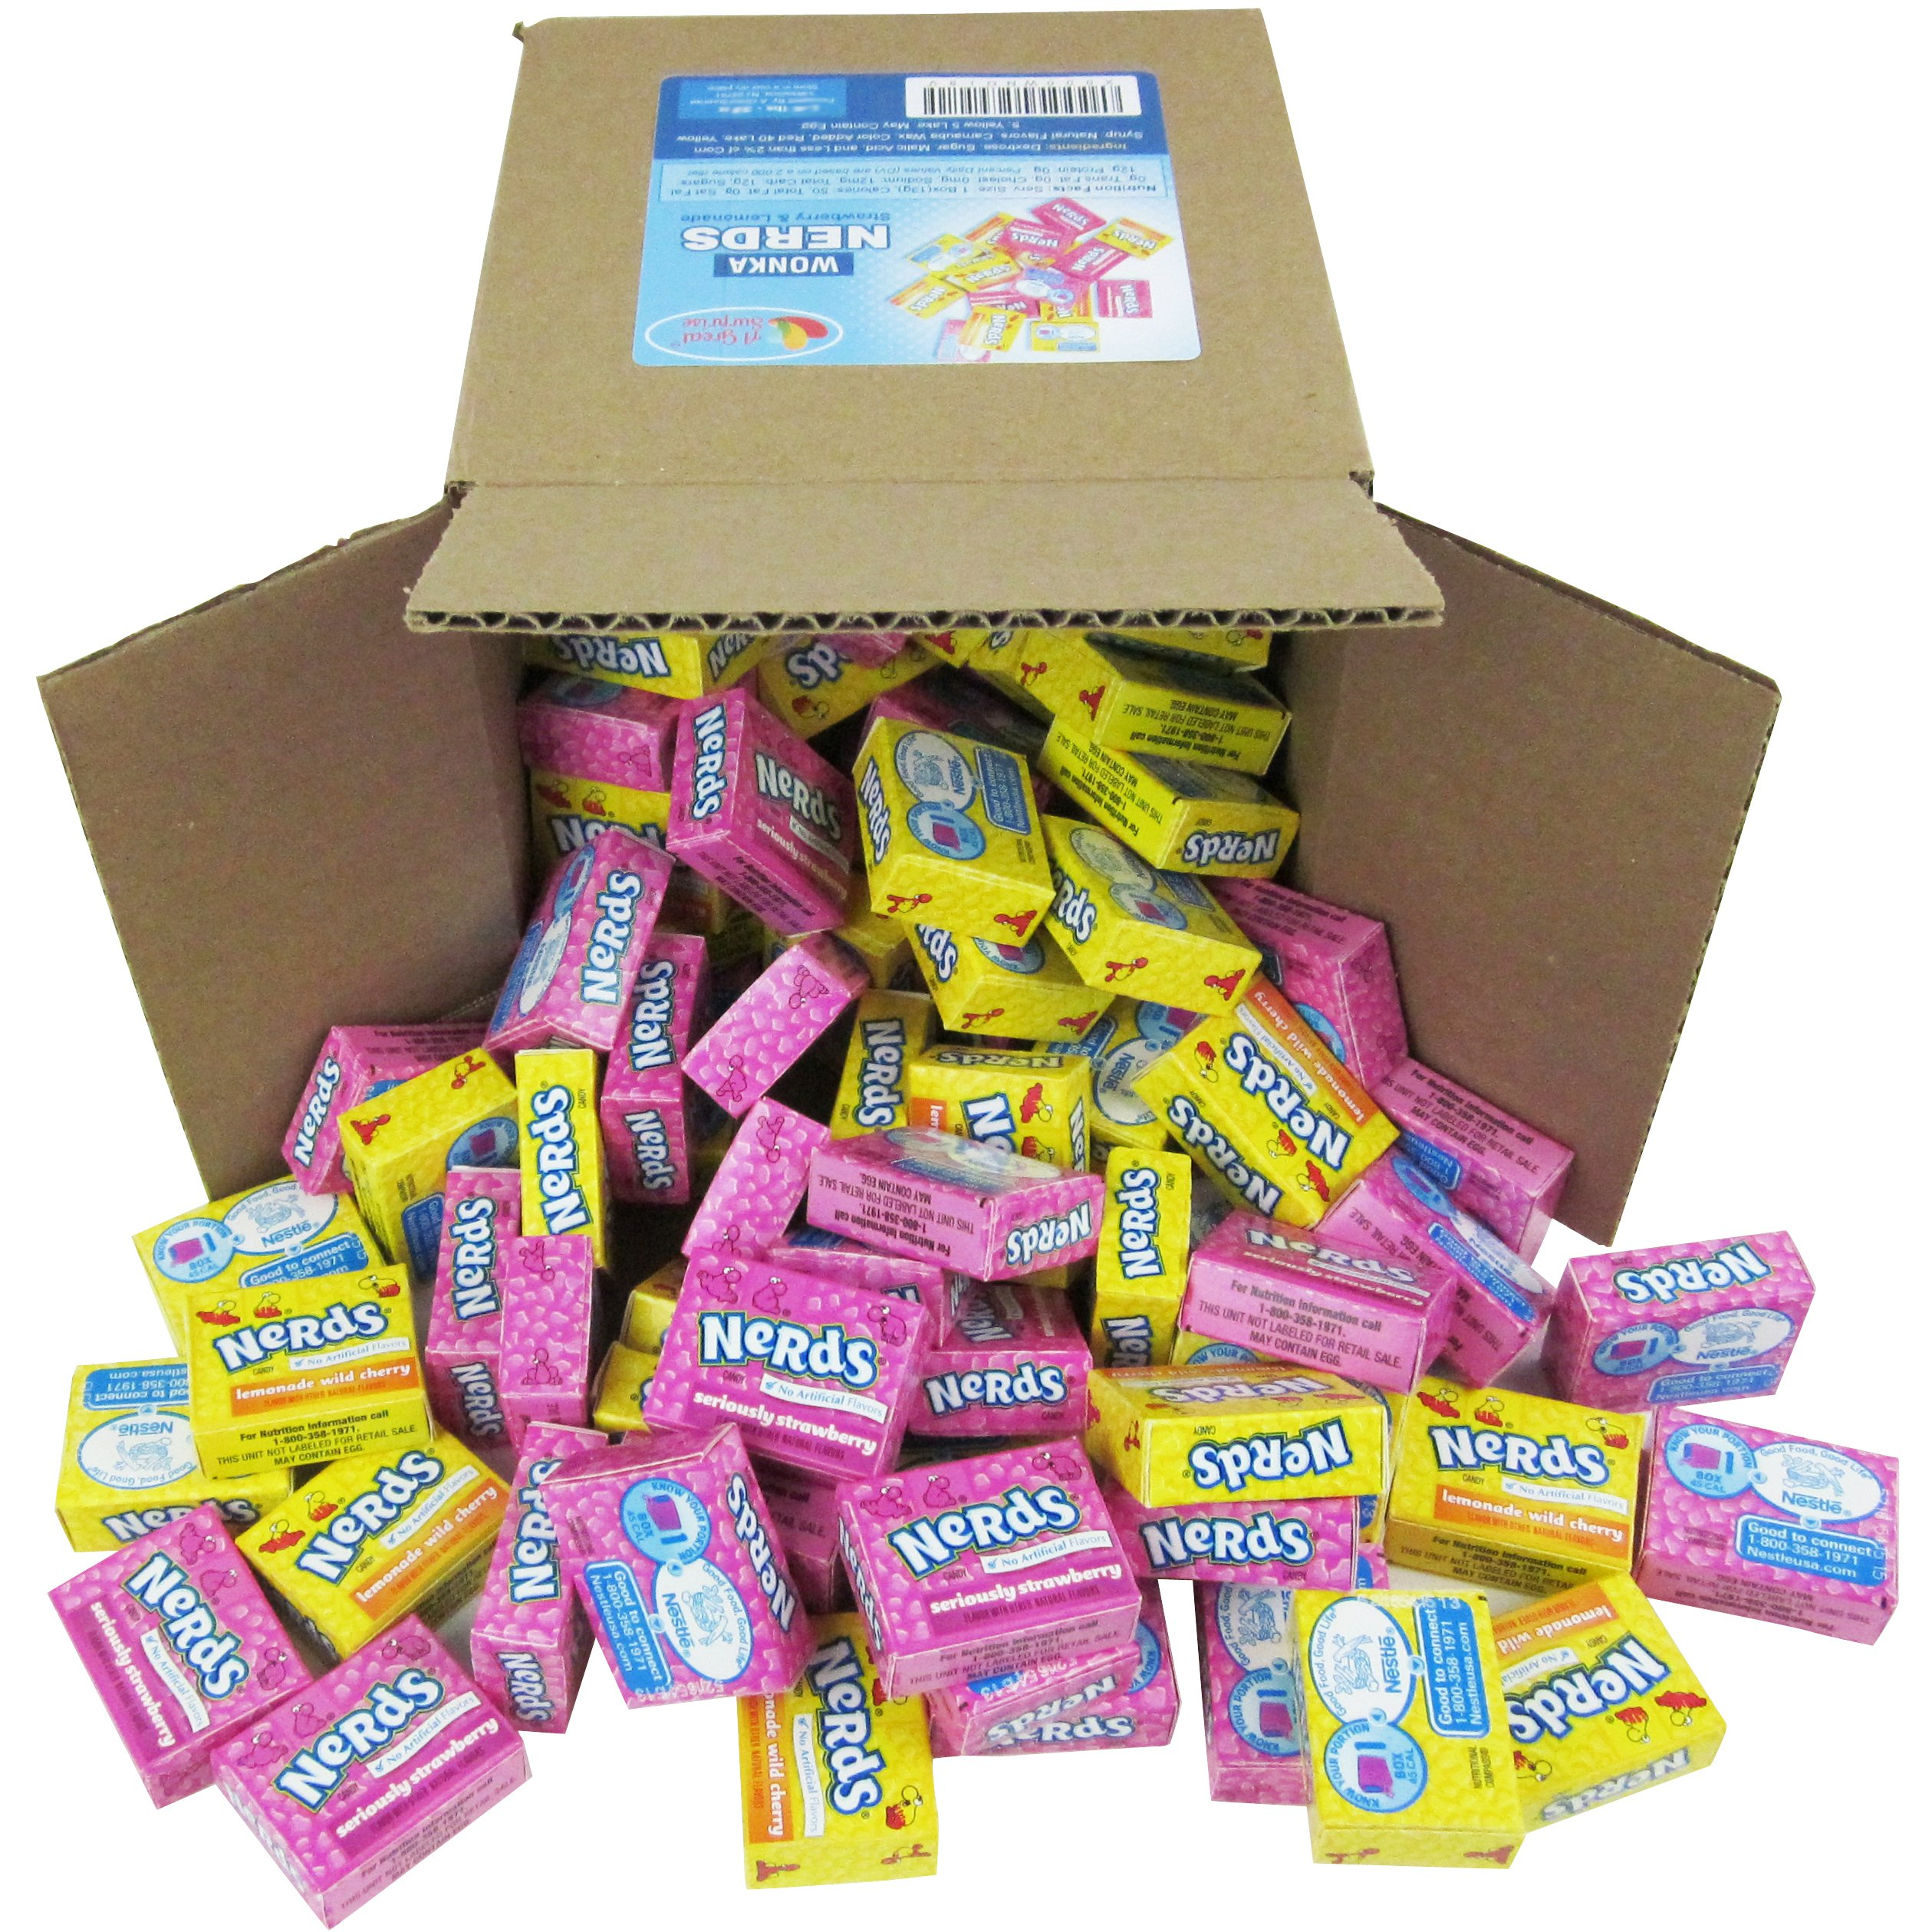 Nerds Candy - Wonka Nerds Mini Boxes, Strawberry and Lemonade Wild Cherry Assortment, 4 LB Box Bulk Candy (Approx. 100 Mini Boxes)